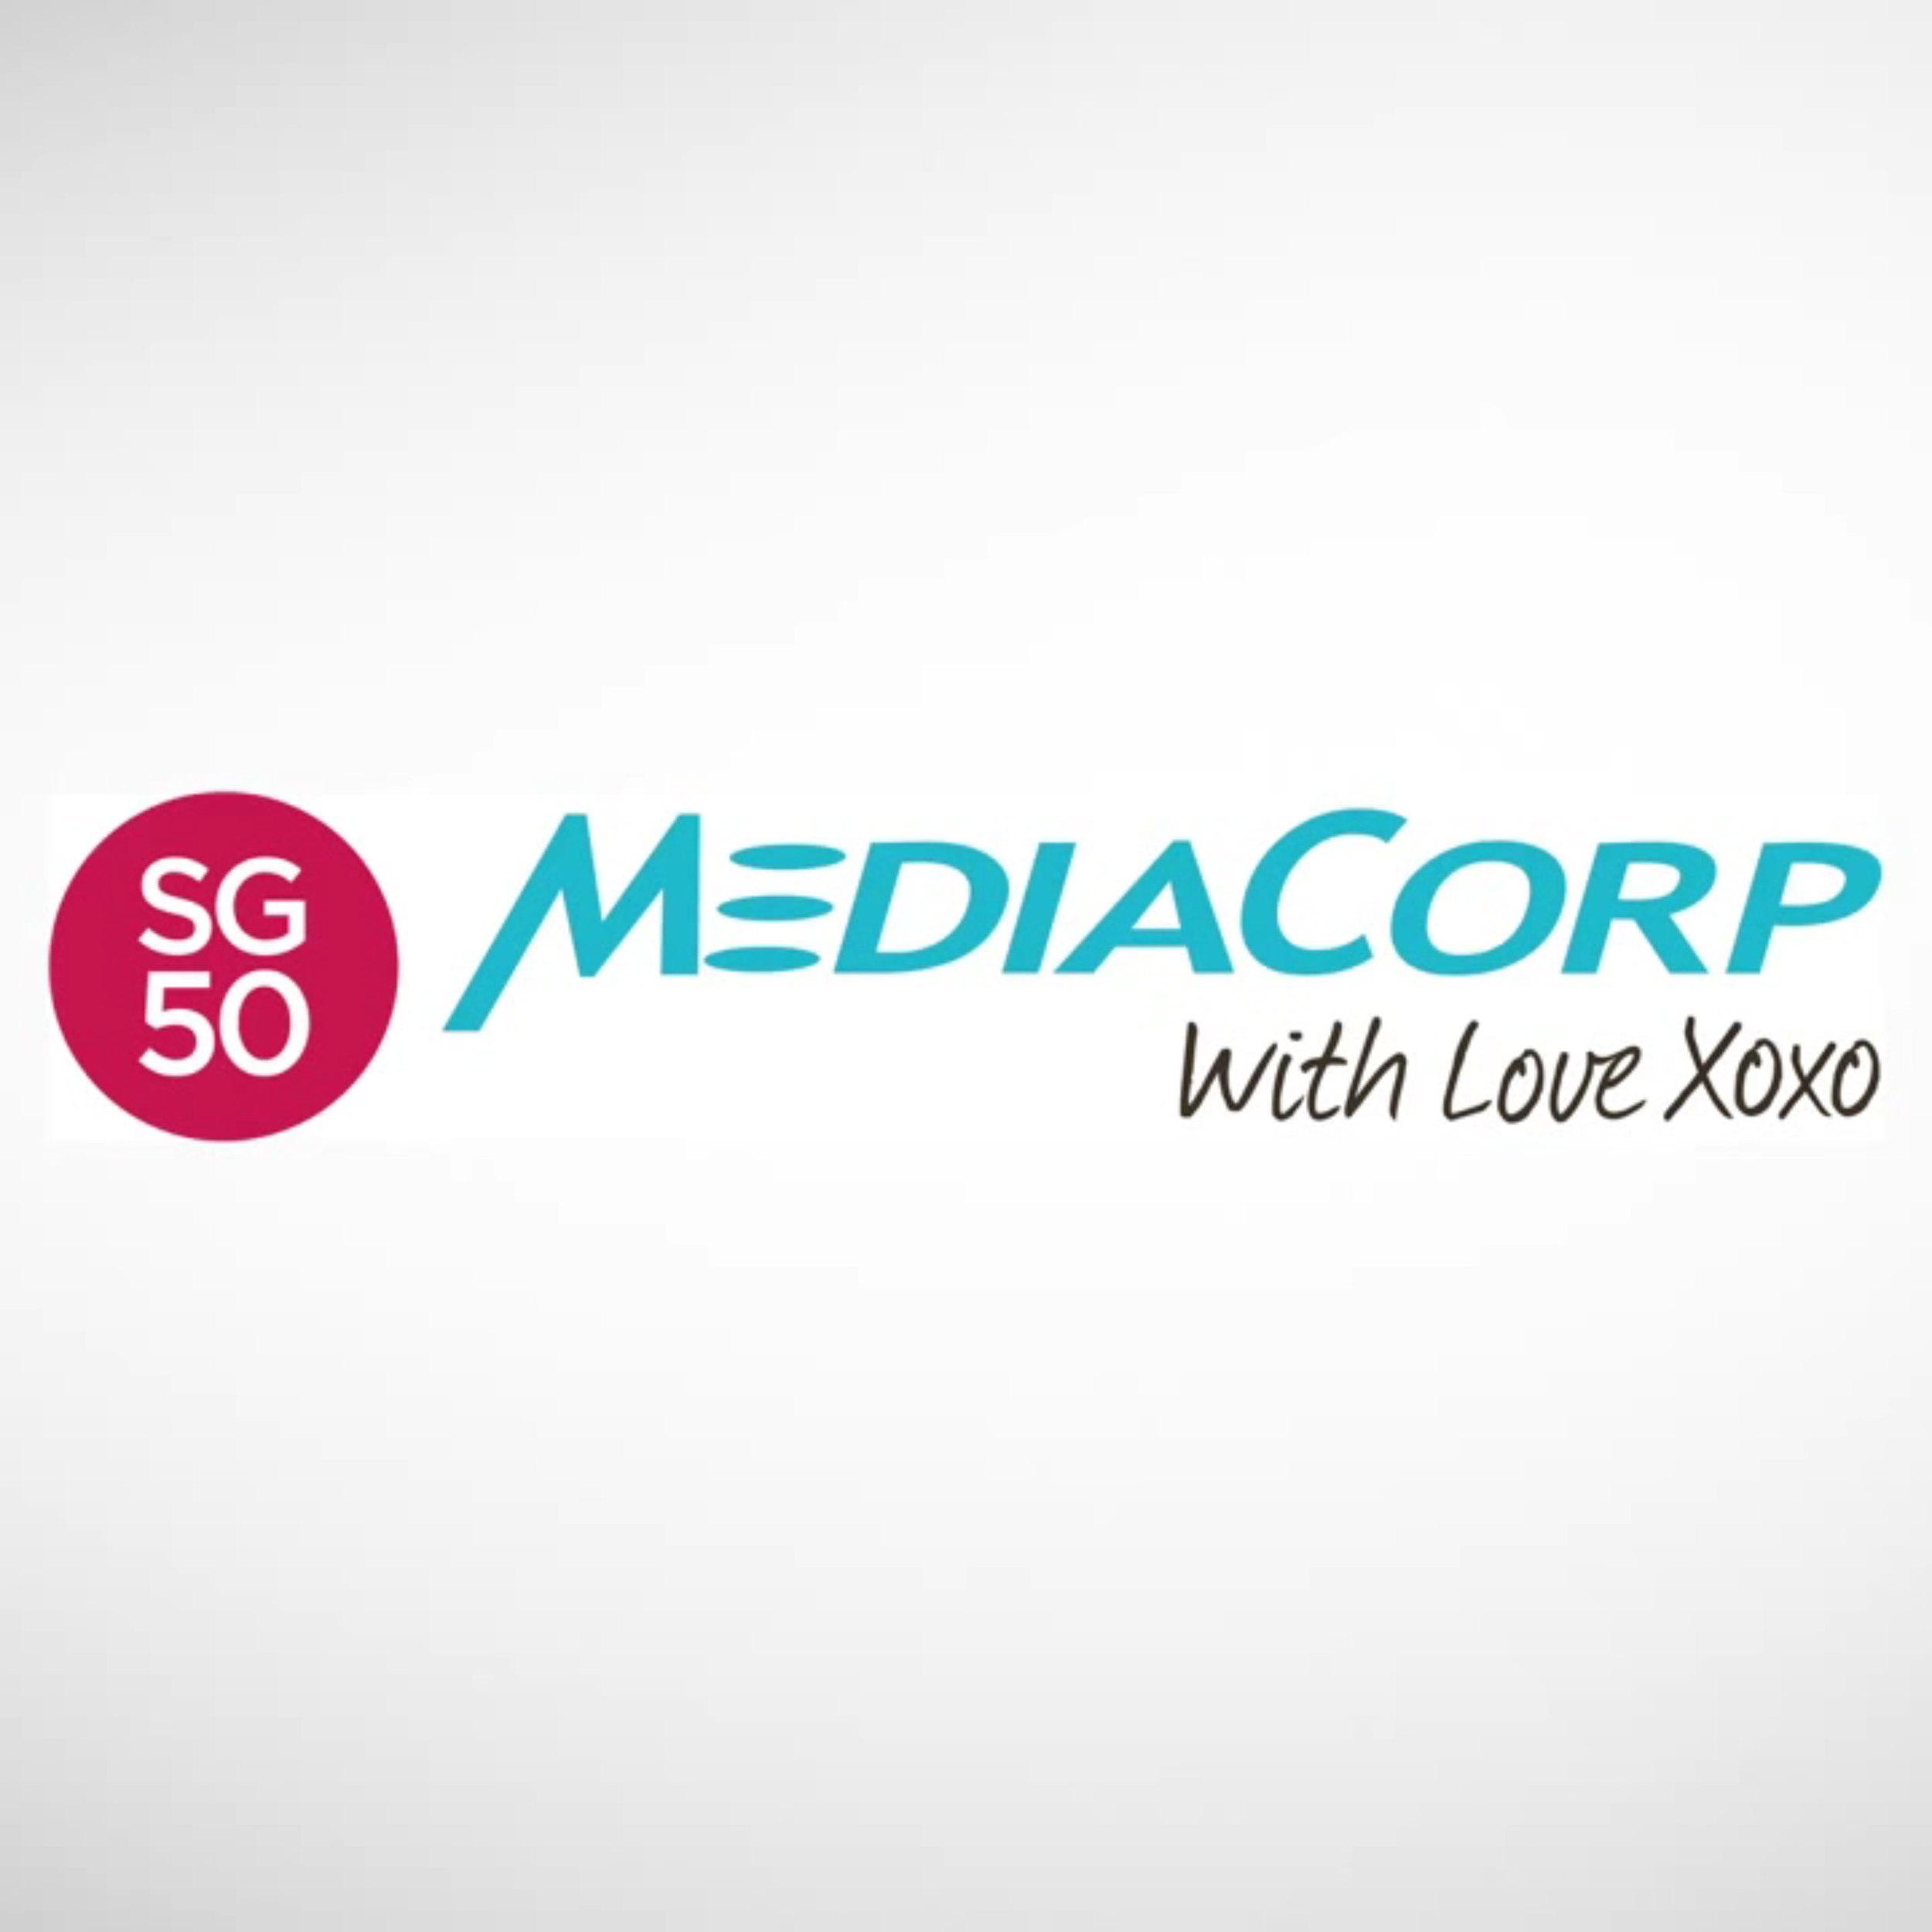 albumart-mediacorp-xoxo-sq.jpg